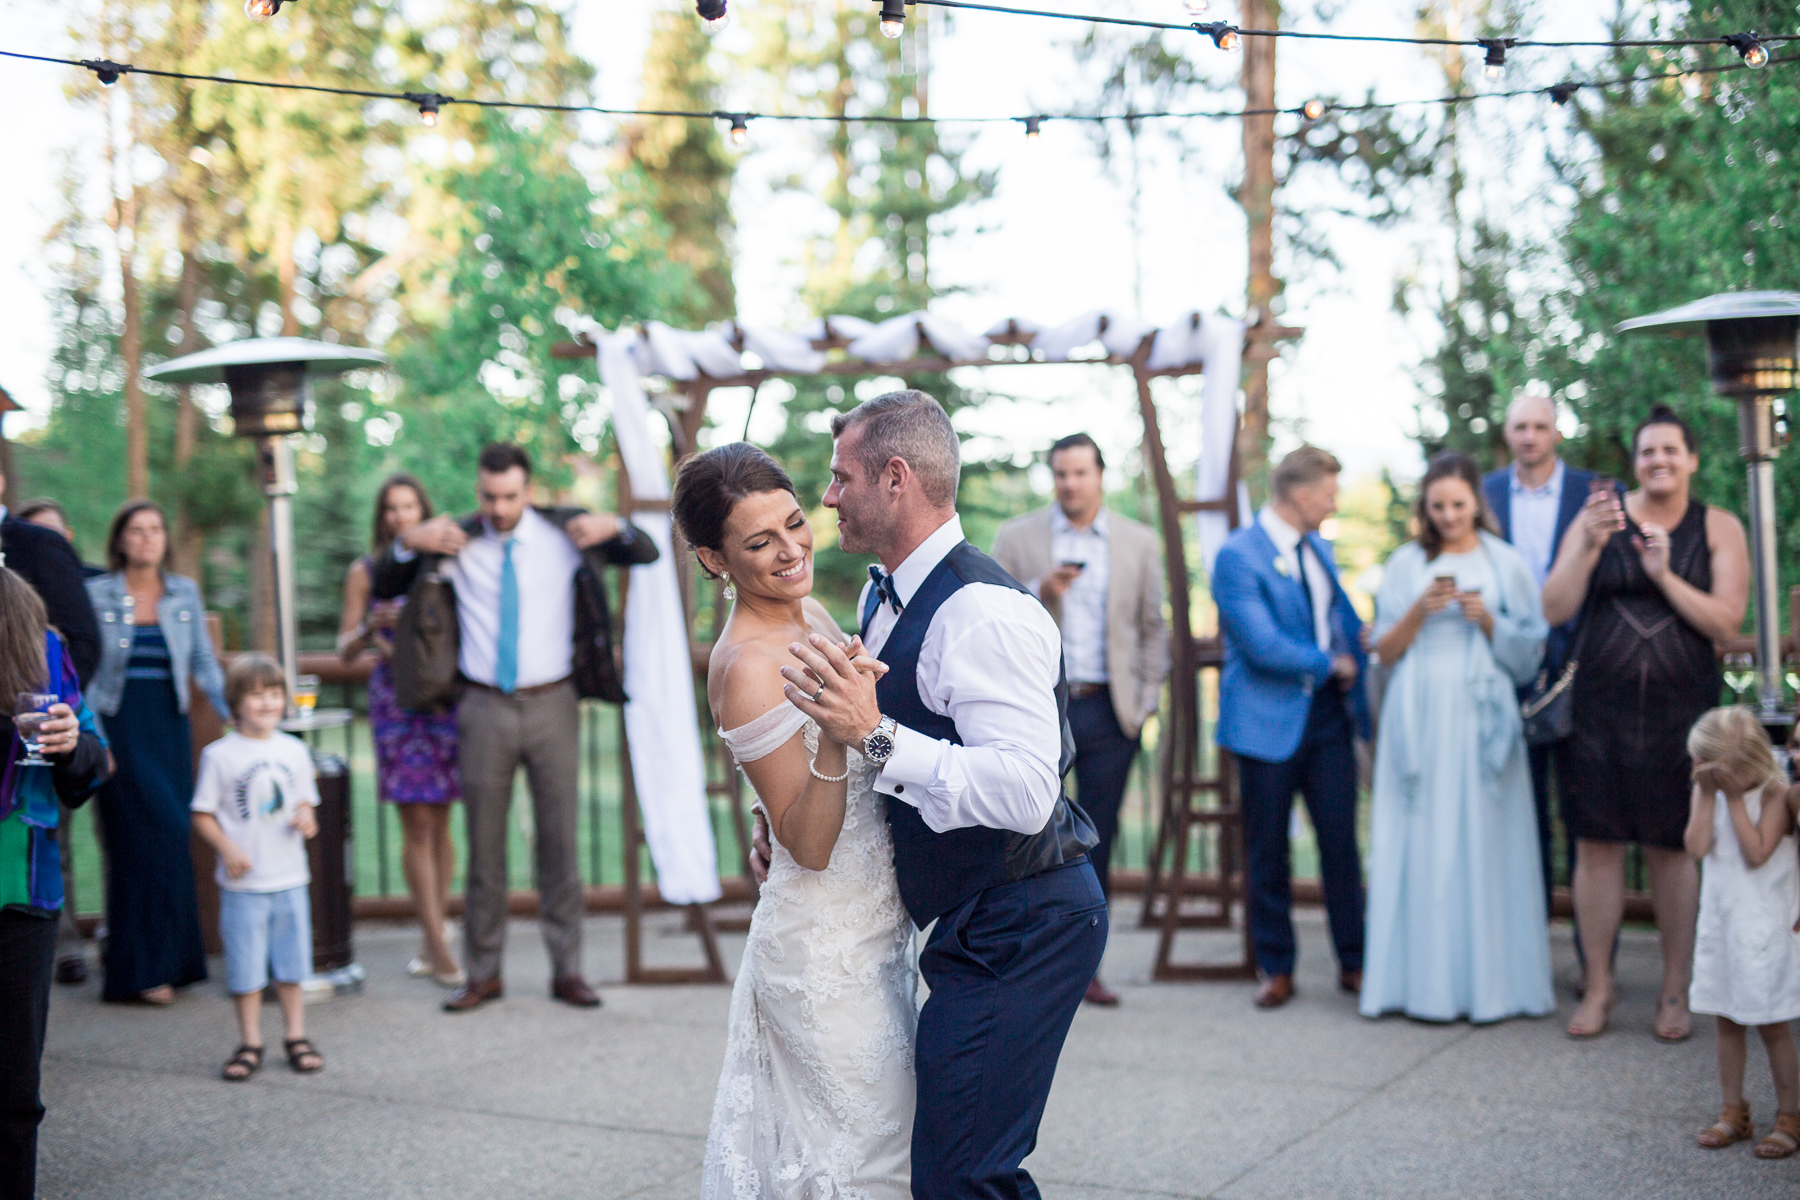 StaciDesign-Colorado-Wedding-5594.jpg